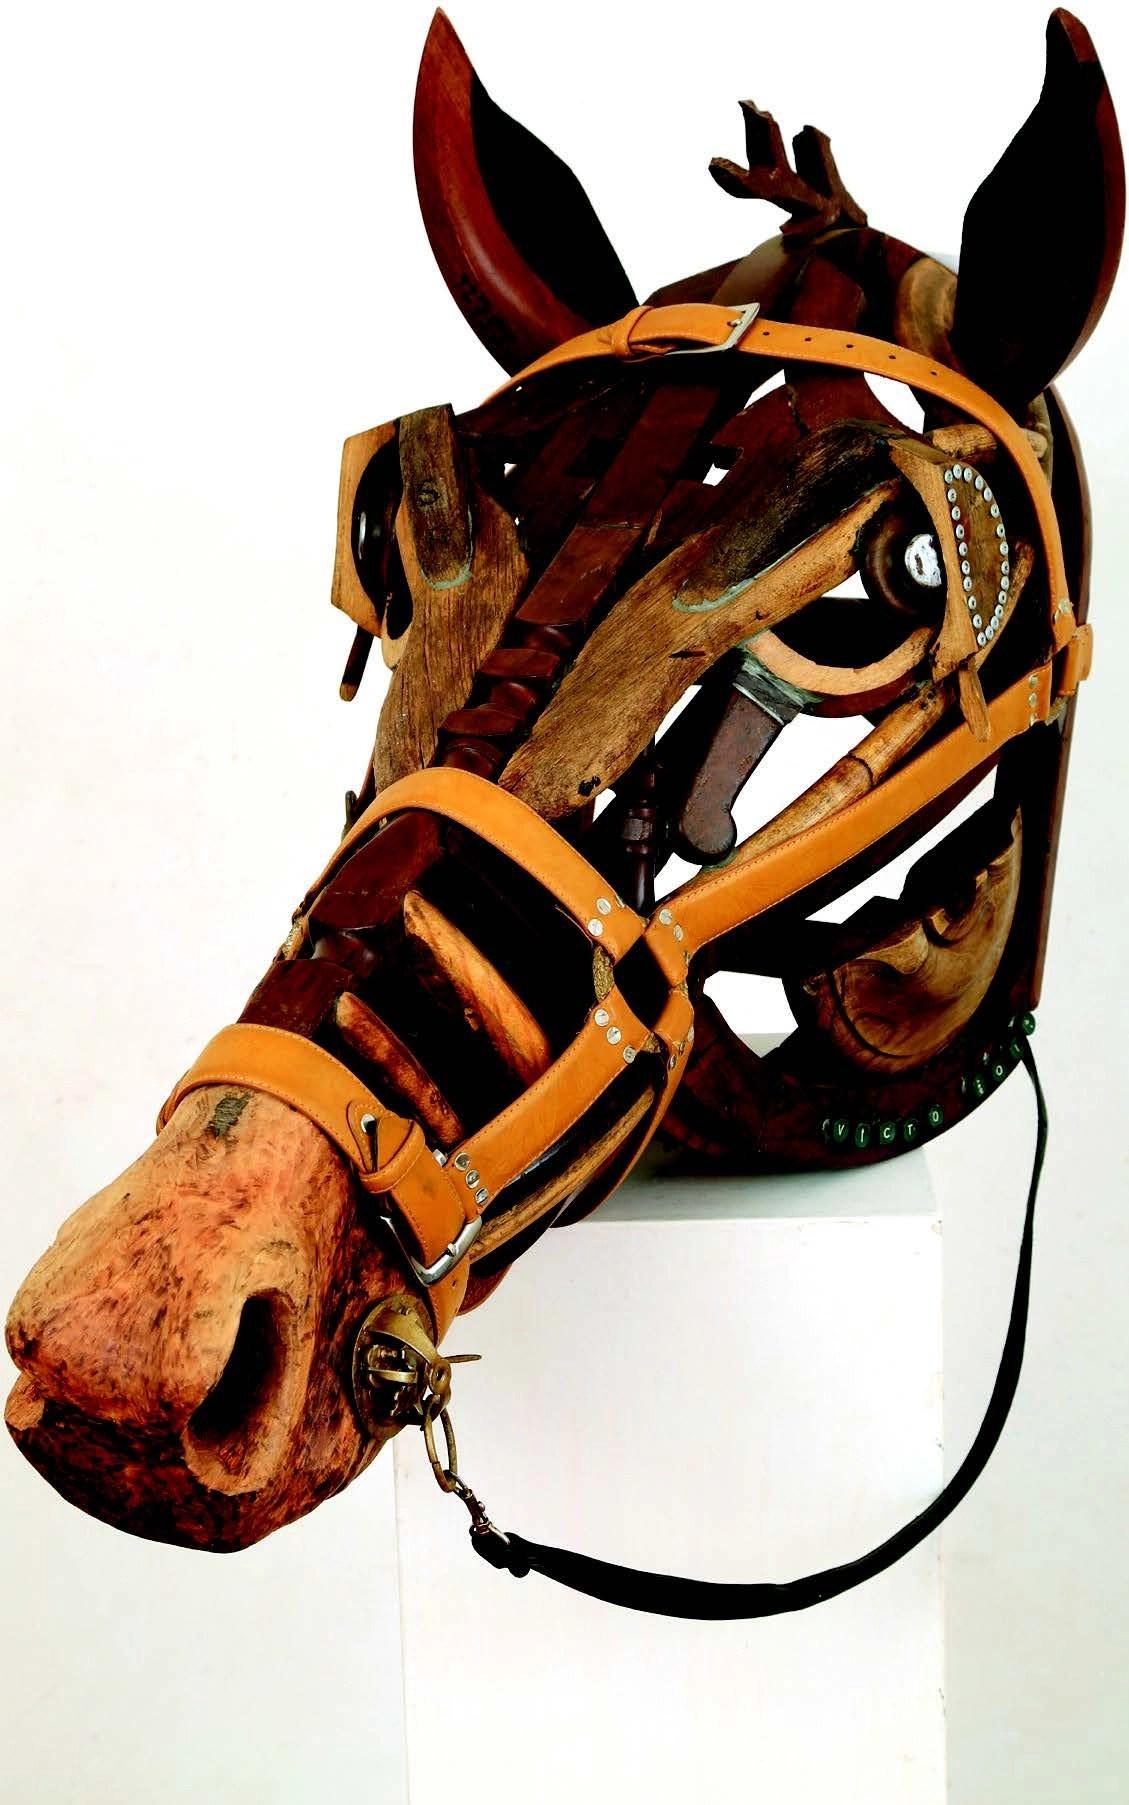 Victor Nyakauru, Rare Mare, 2014, Wood and Leather, 102 x 44 x 62 cm